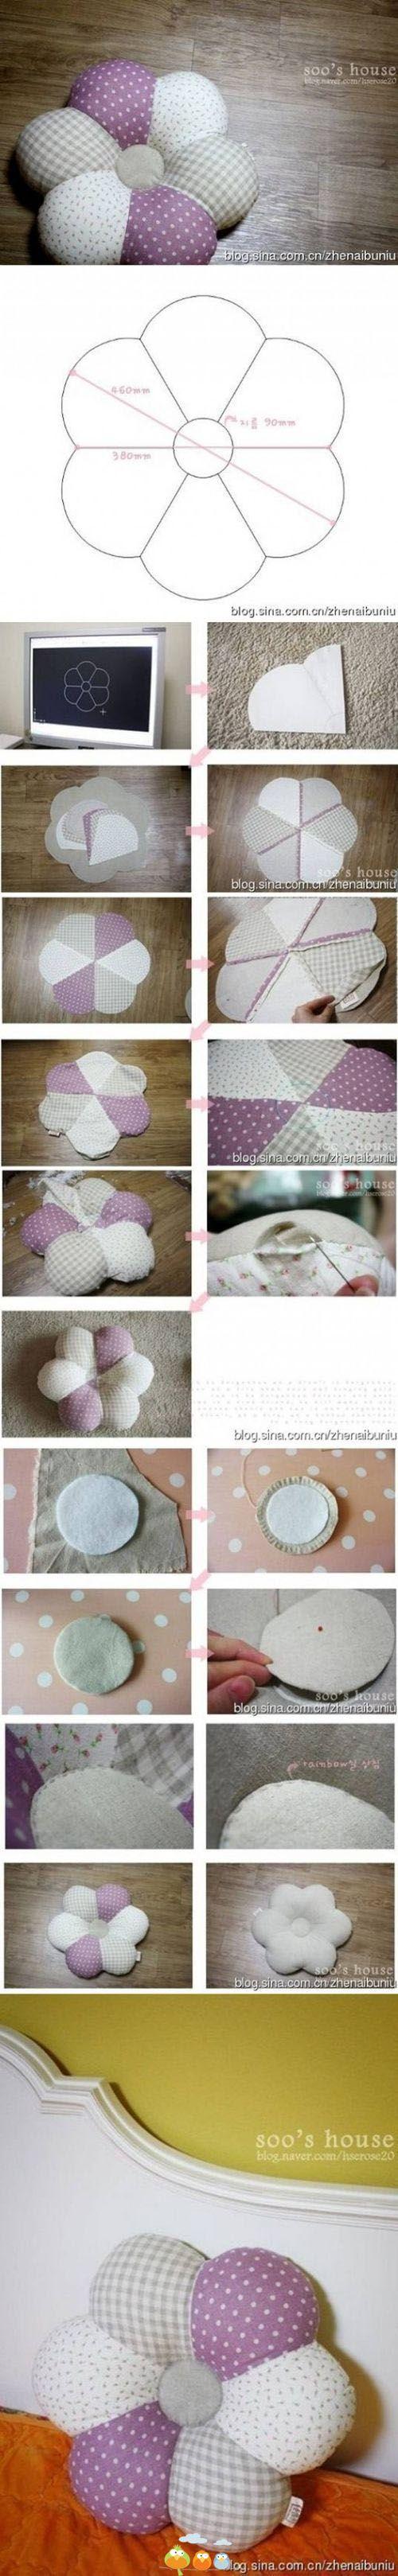 classic pincushion pattern as throw pillow | Almofadas | Pinterest ...